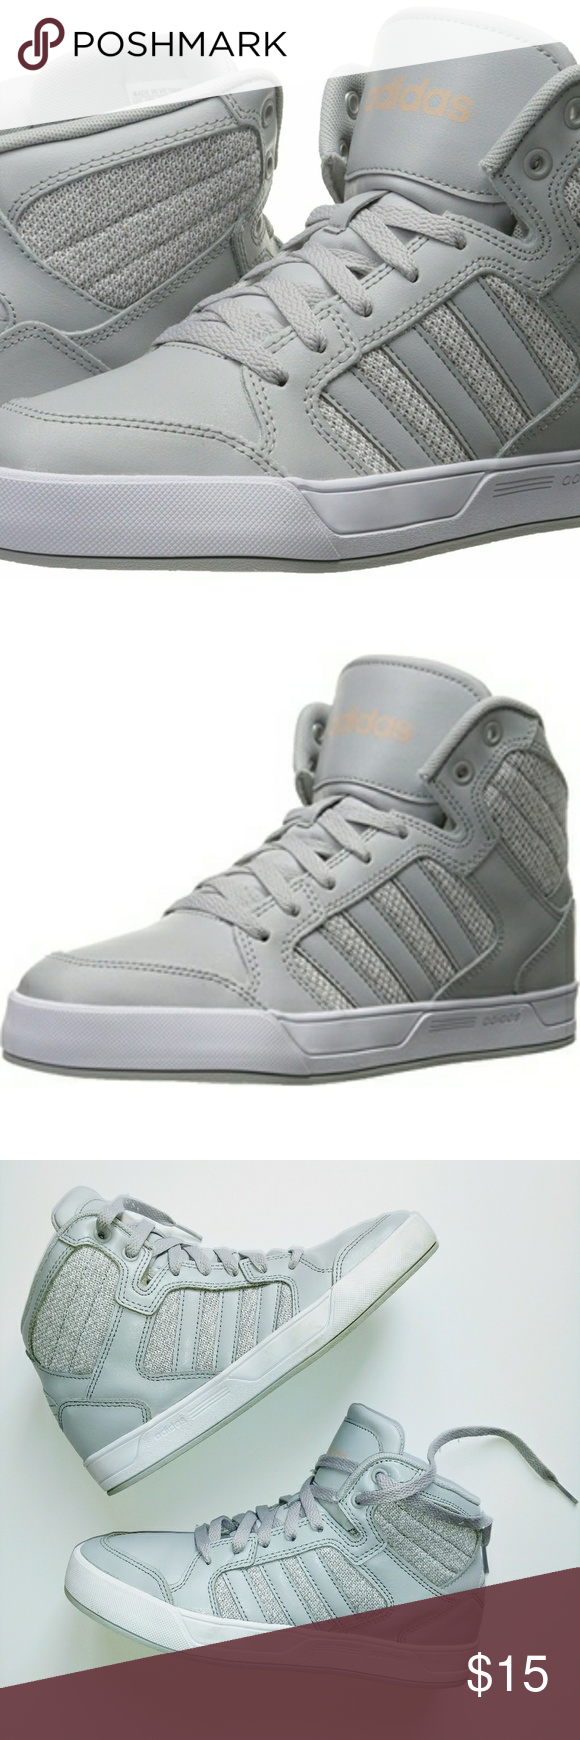 usa adidas neo high tops grey fabric 1ae59 7be17